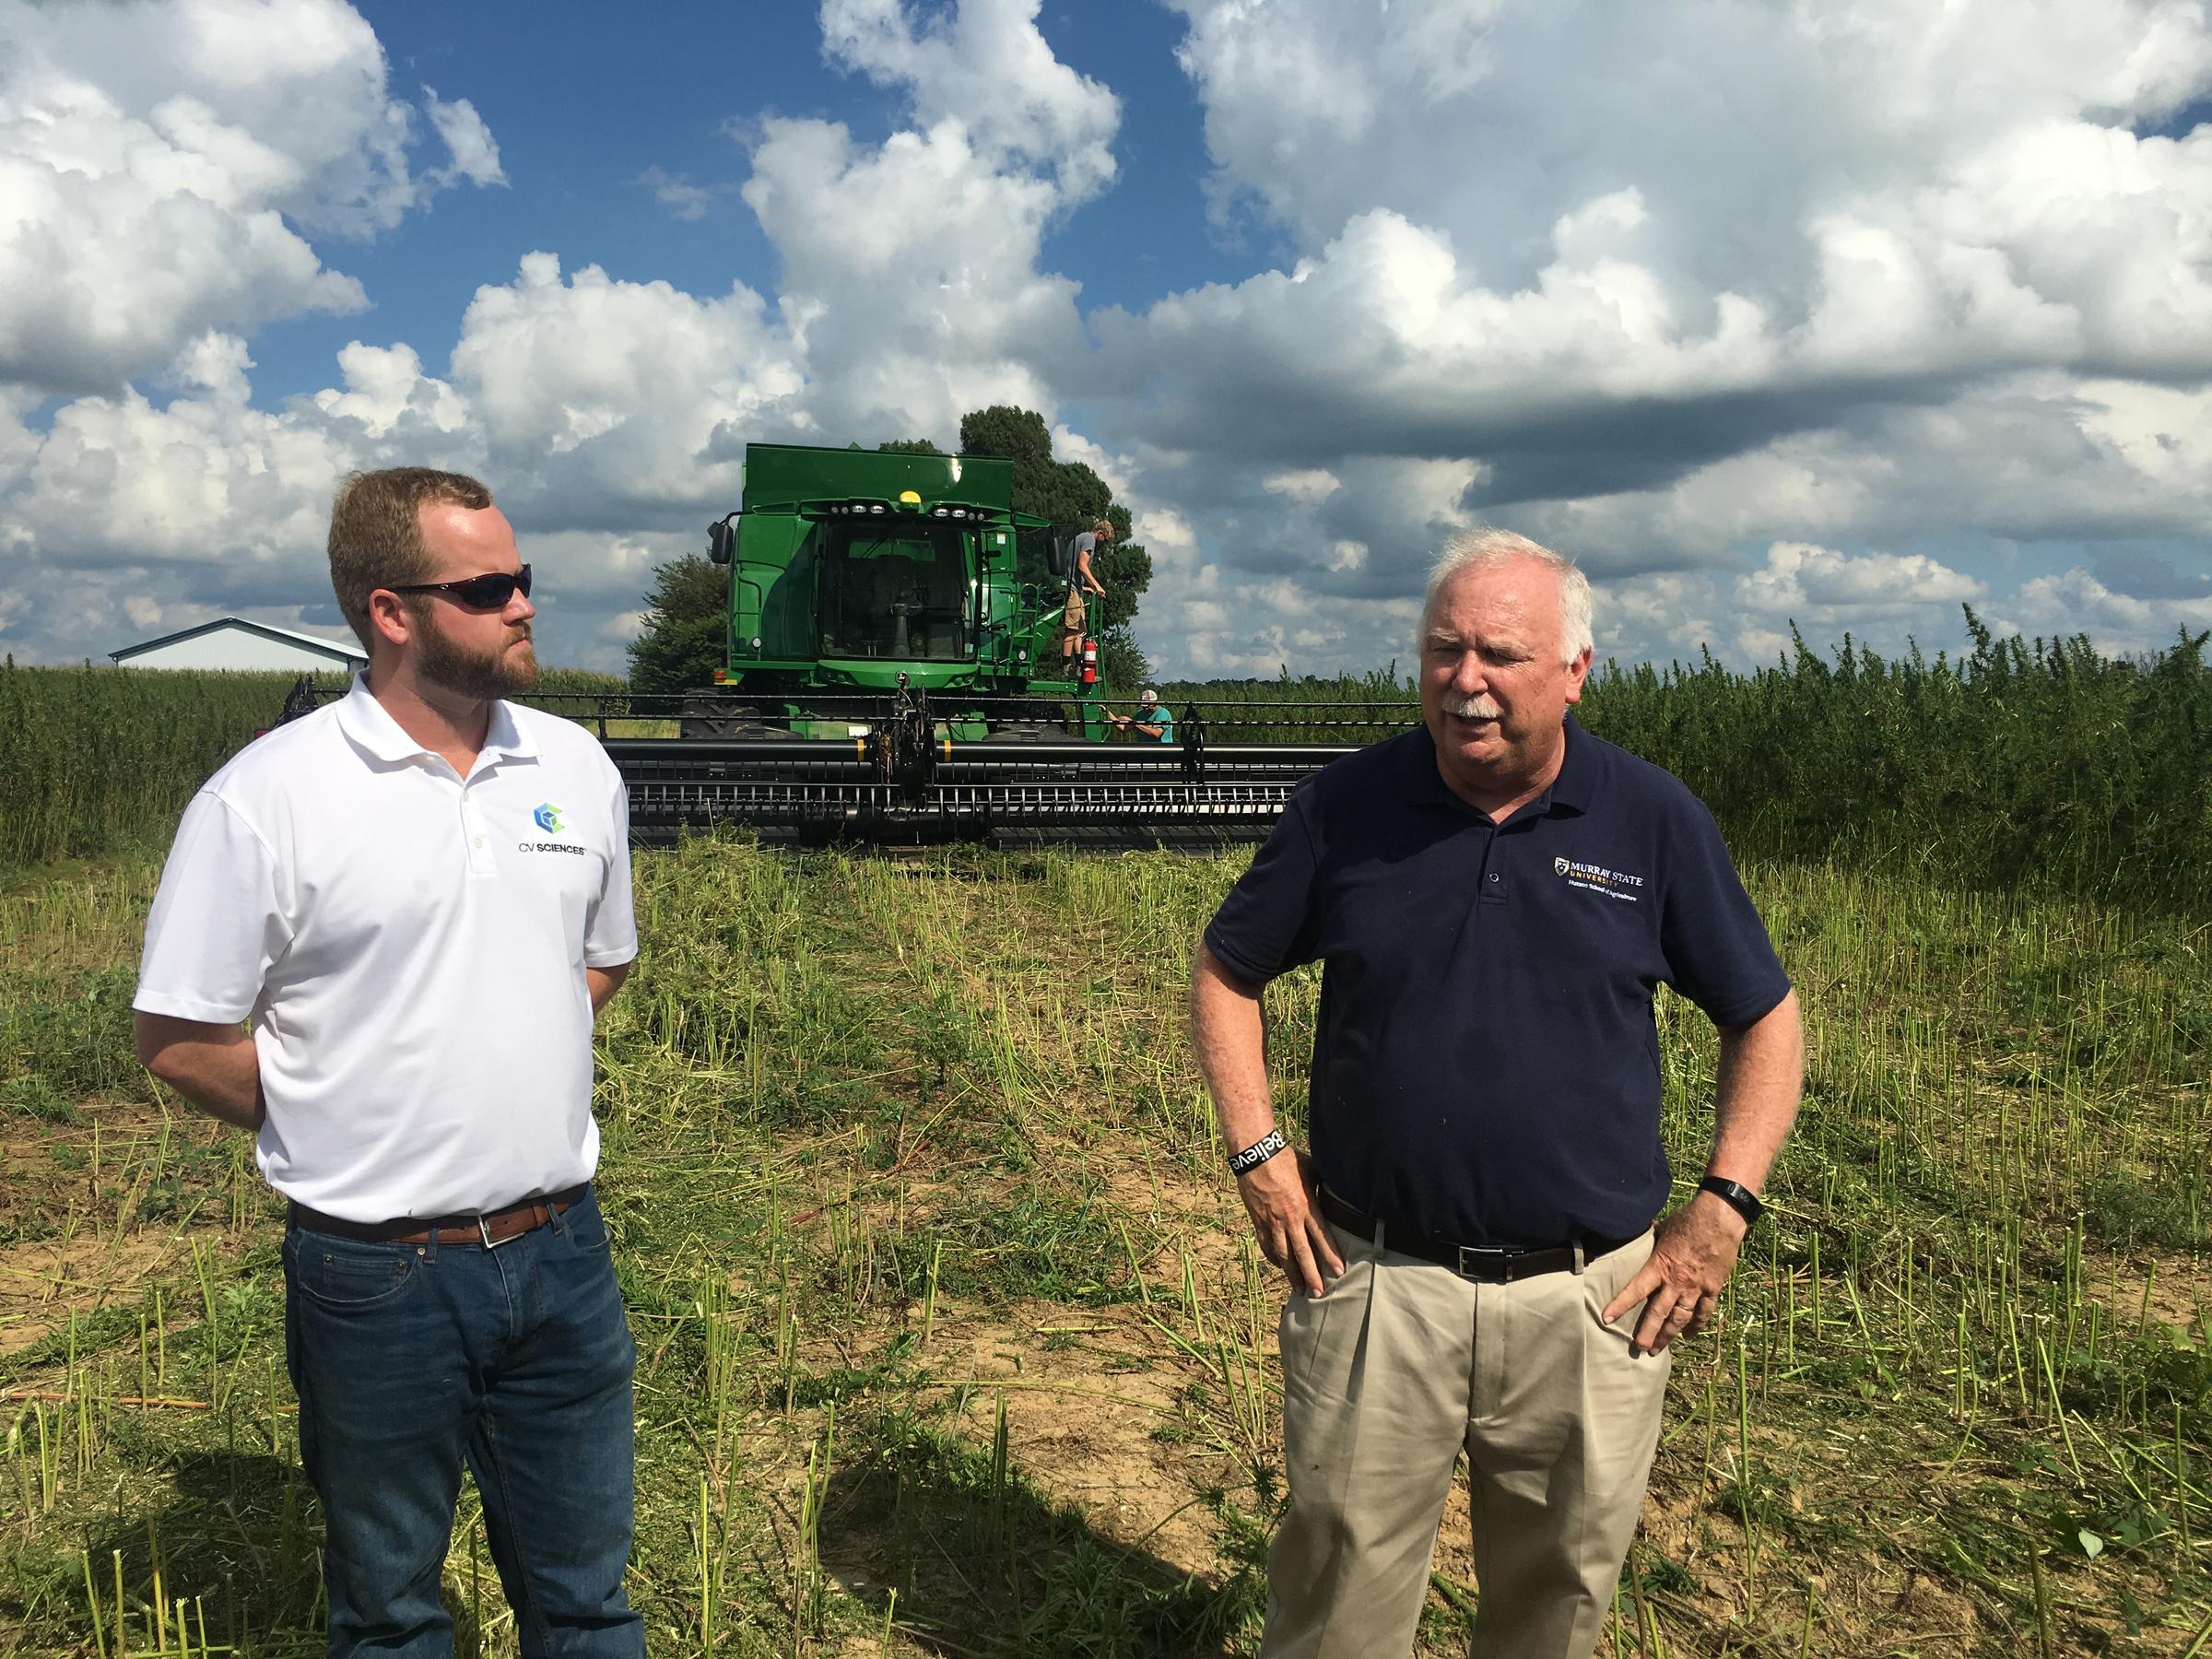 Murray State Starts Hemp Harvest with Combine, Studies